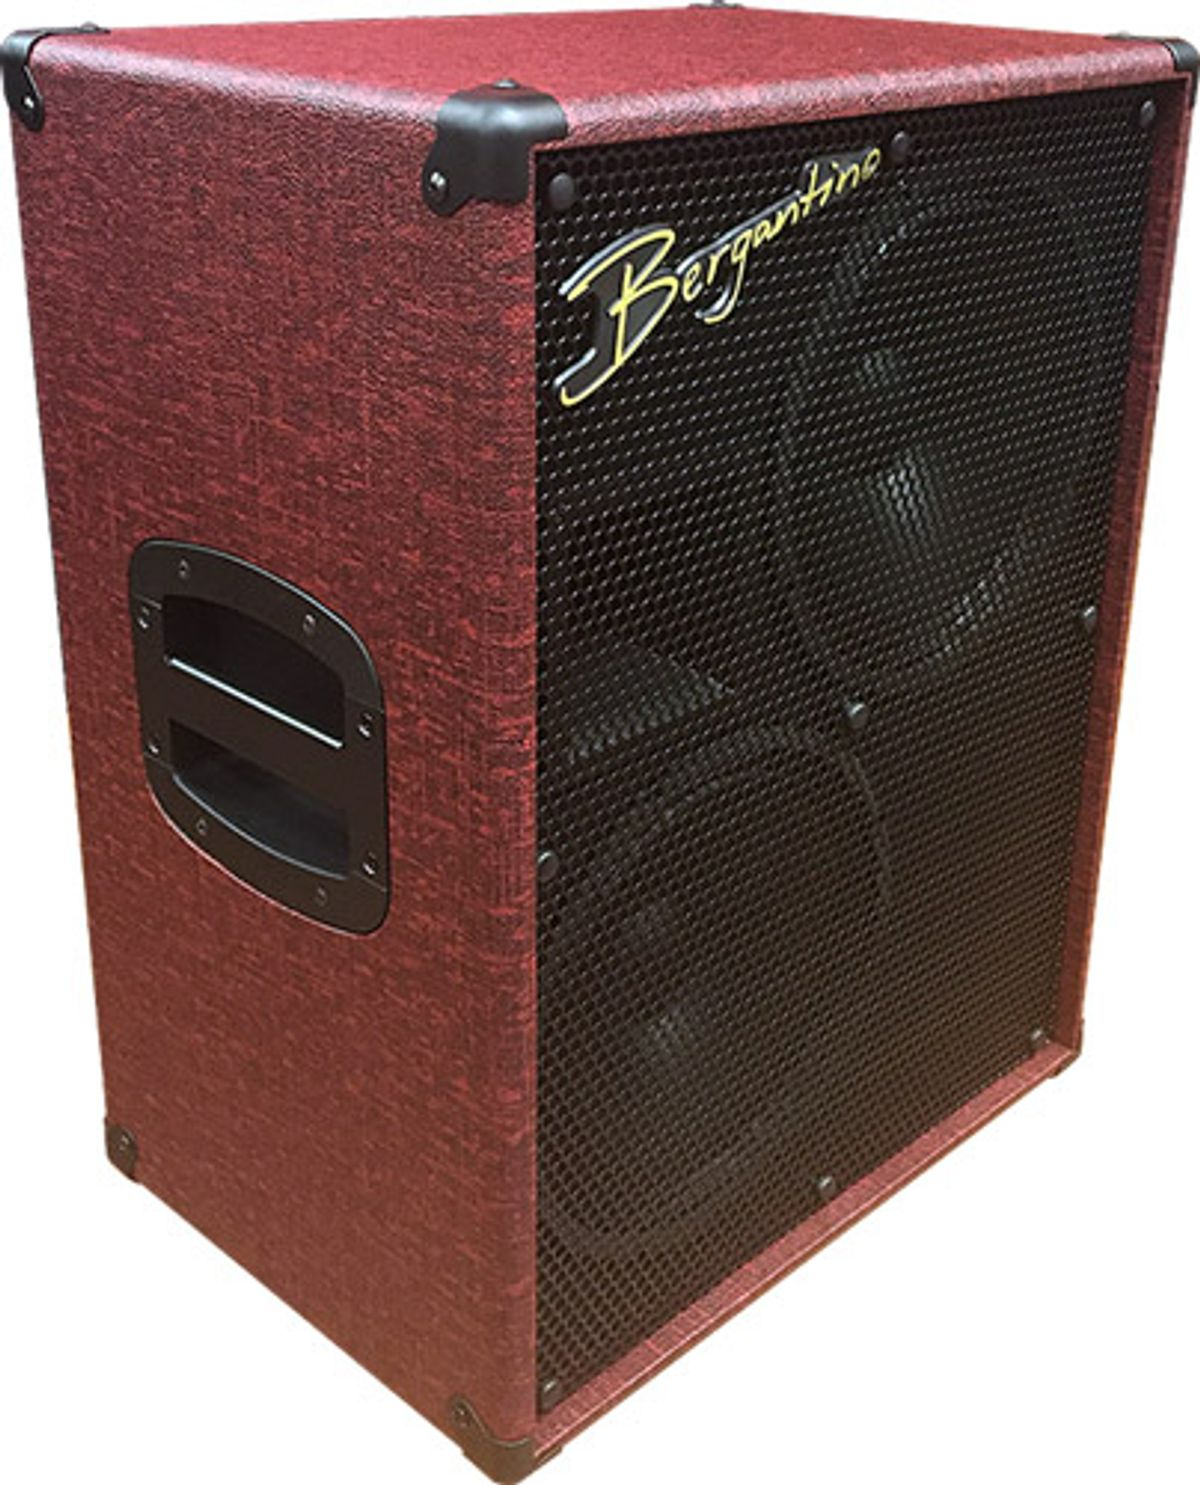 Bergantino Audio Systems Announces the HG310